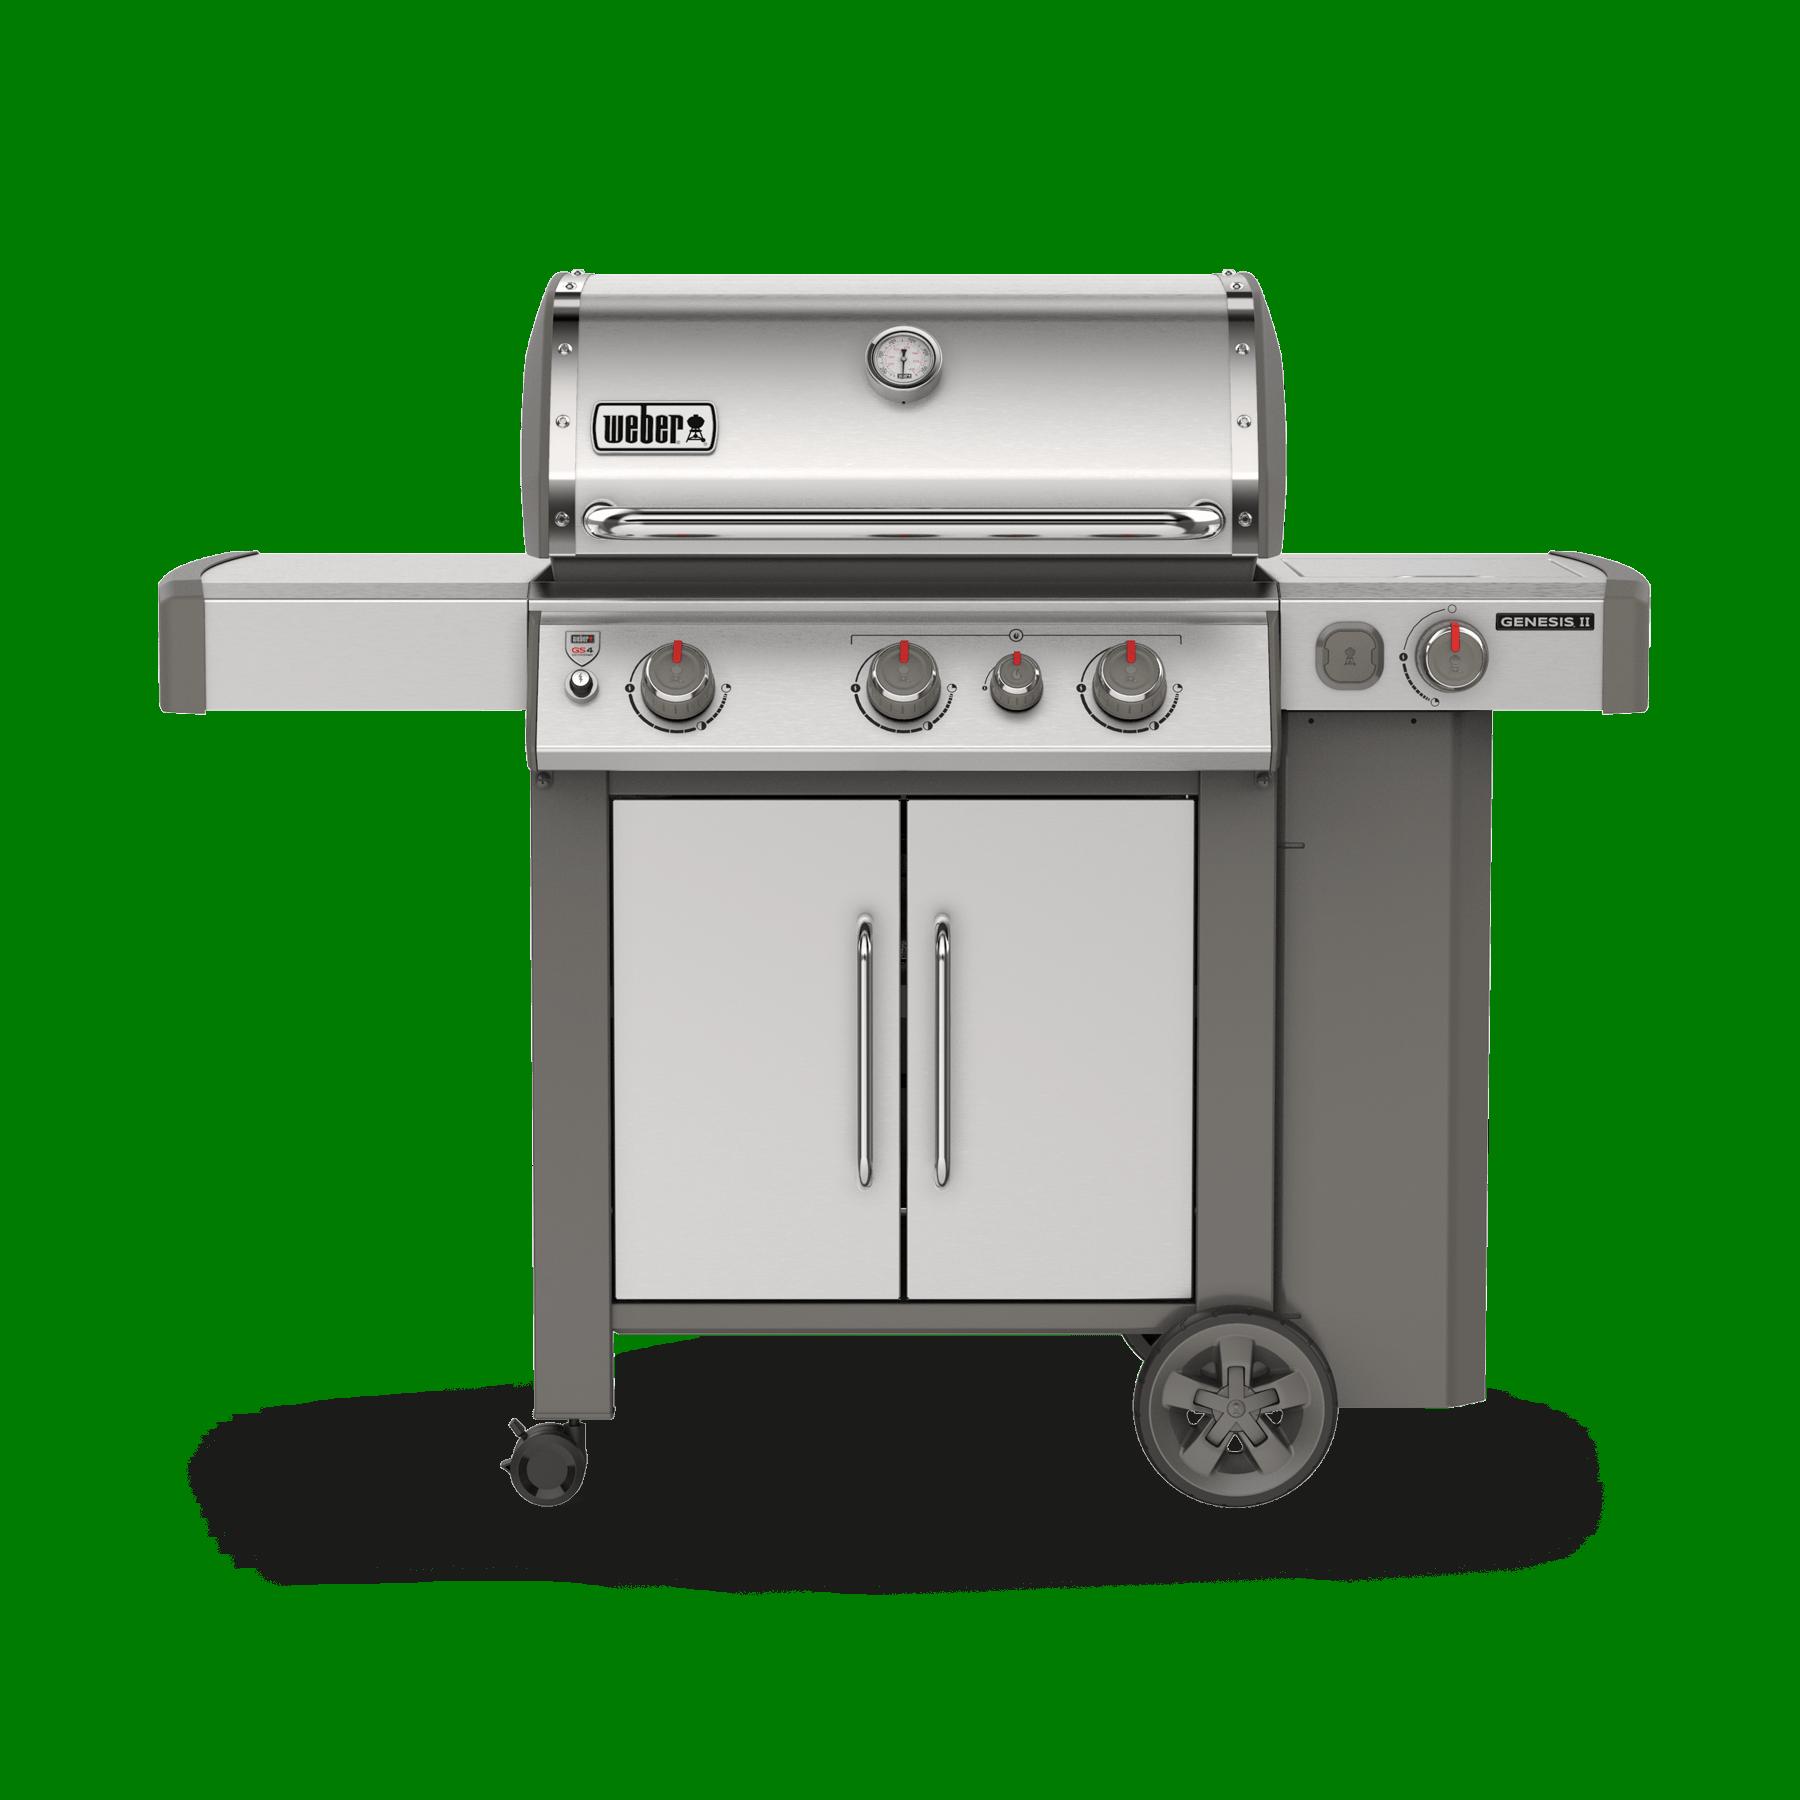 Asador de gas Genesis® II S-335